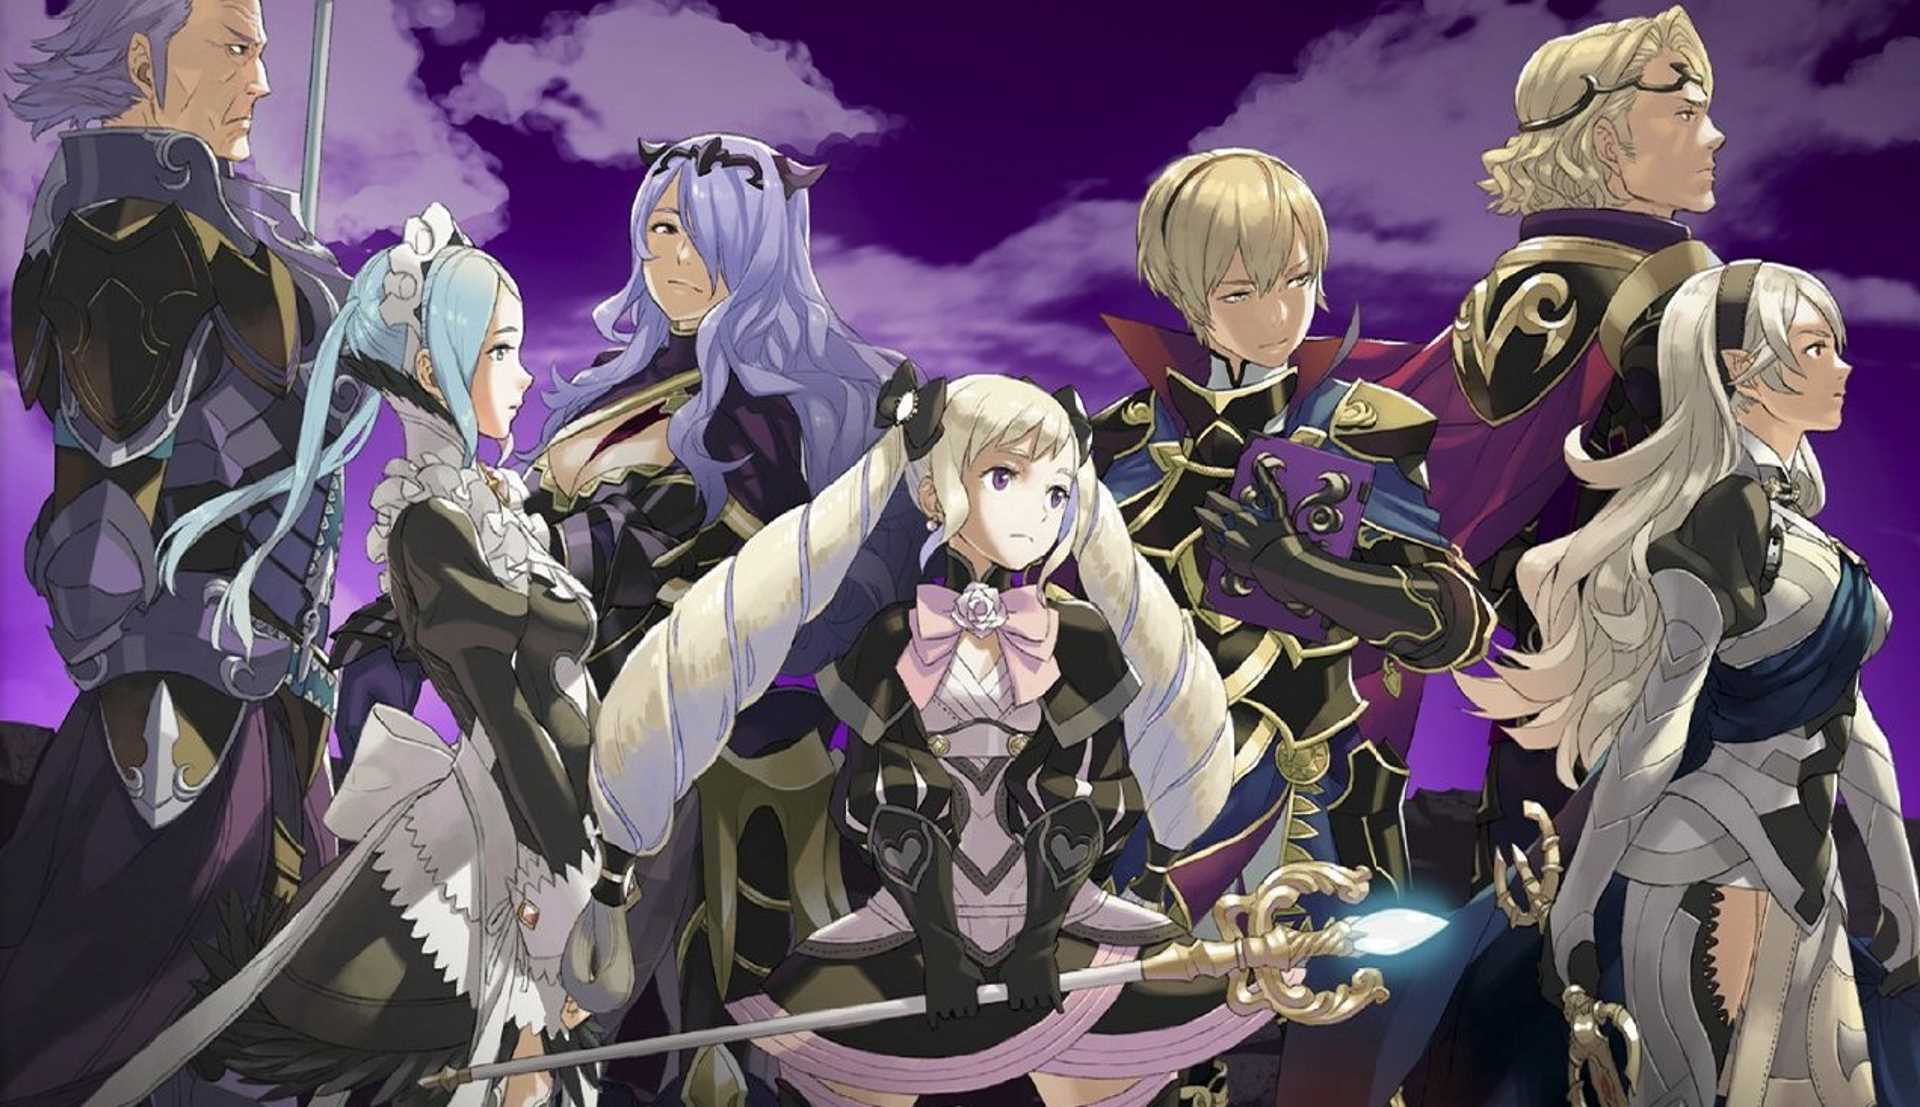 fire, Emblem, Tactical, Rpg, Anime, Manga, Stealth, Faiae